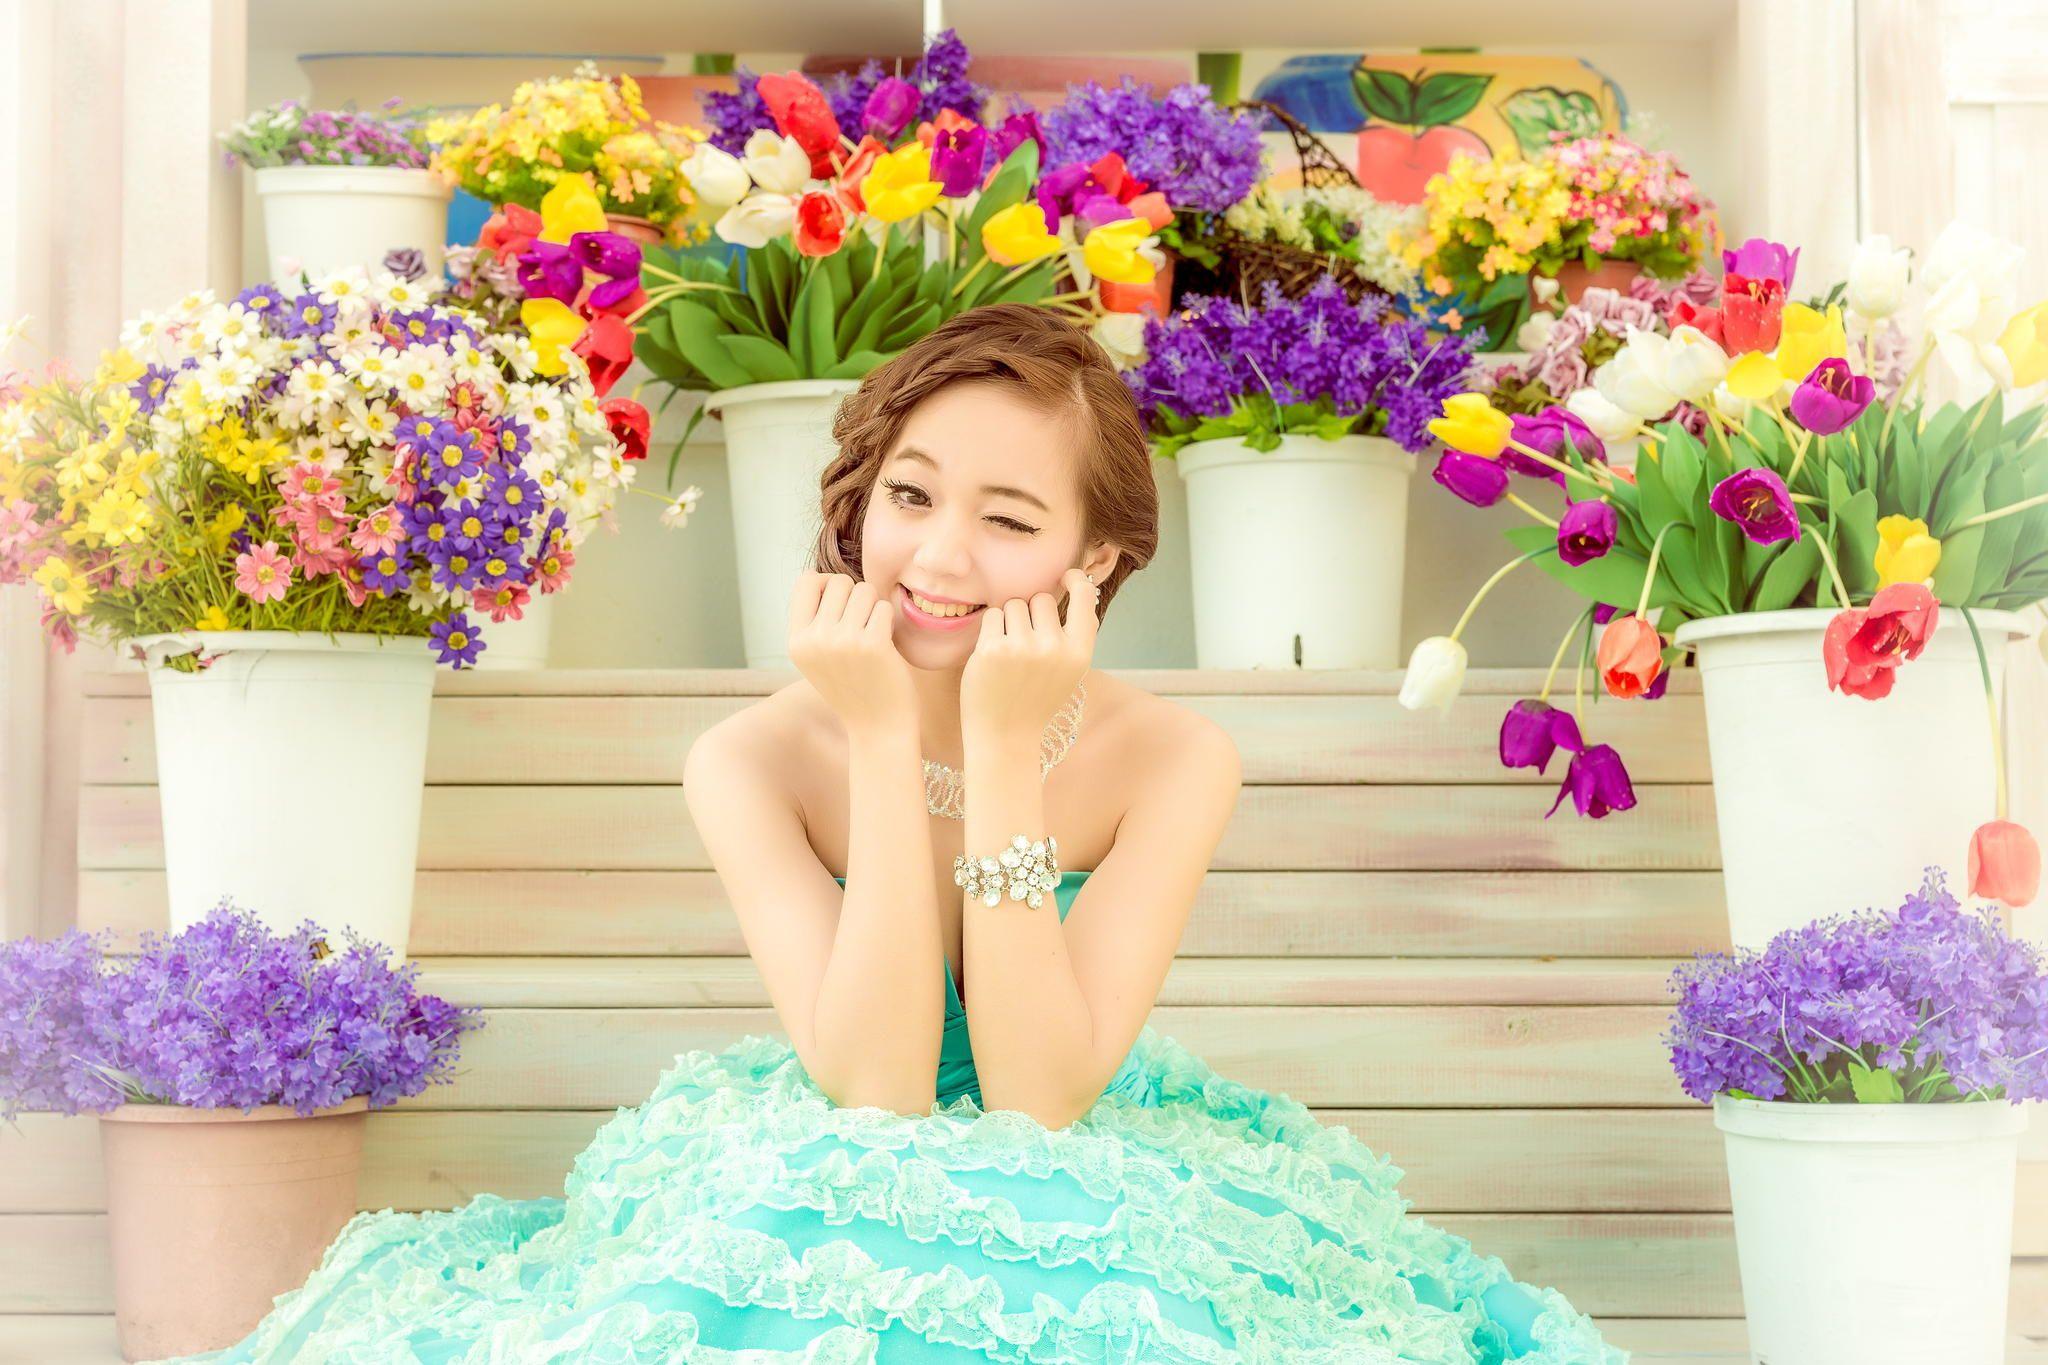 Princess Korean Girl Hd Wallpaperprincess Korean Girl Hd Wallpaper